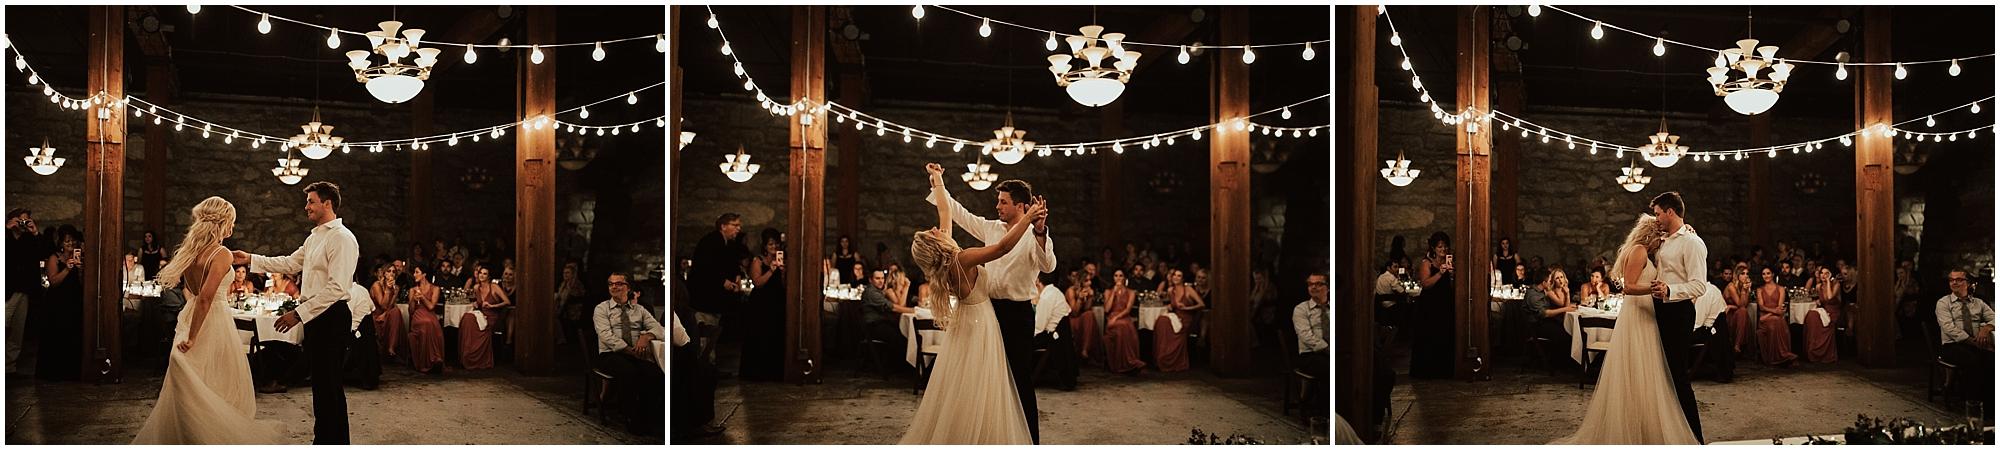 Chateau Rive Spokane Wedding Cassie Trottier Photography1147.jpg